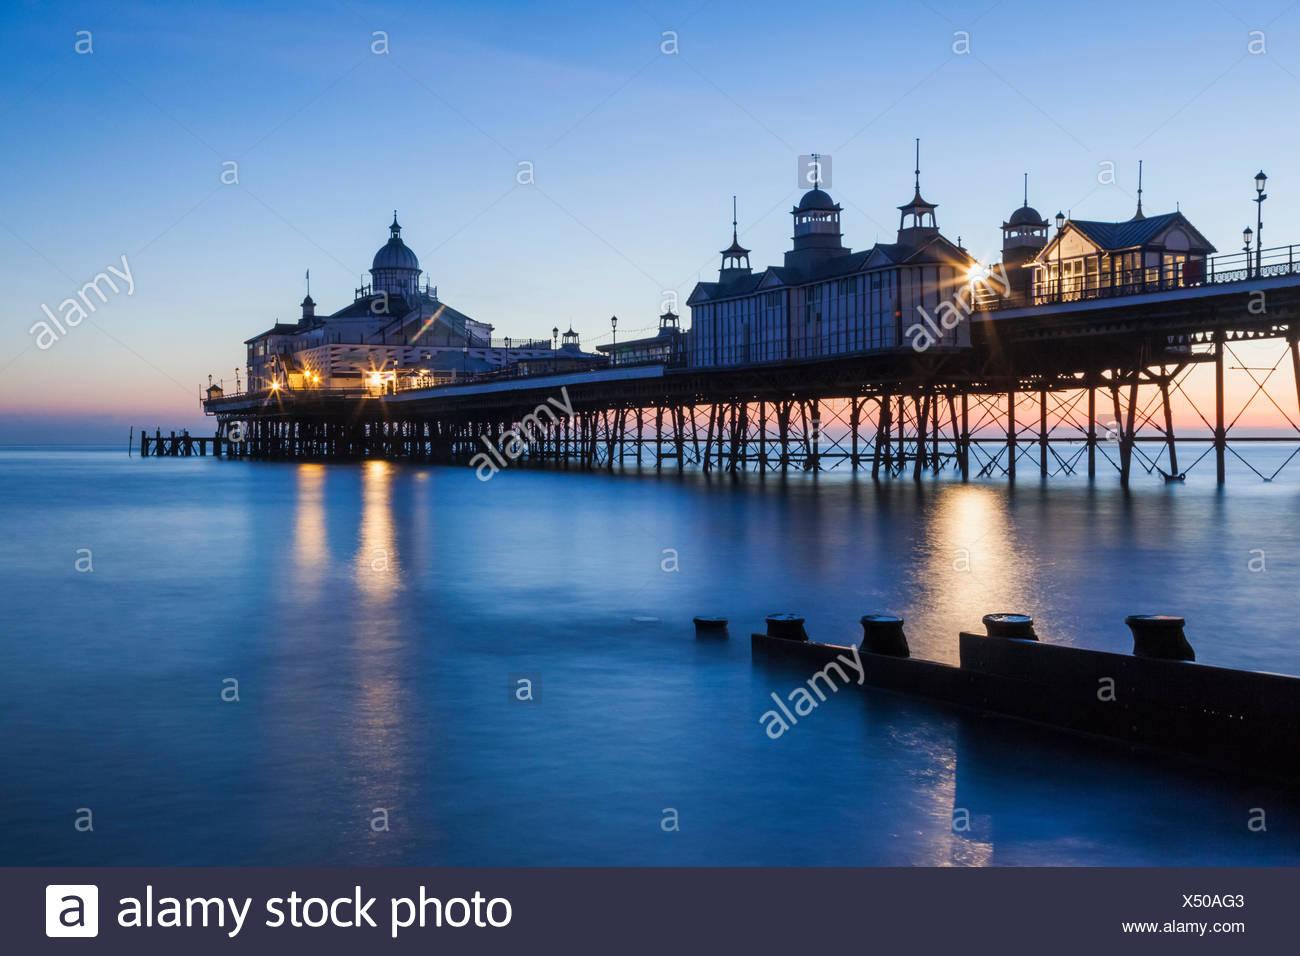 Inglaterra, East Sussex, Eastbourne, Eastbourne Pier al amanecer Imagen De Stock